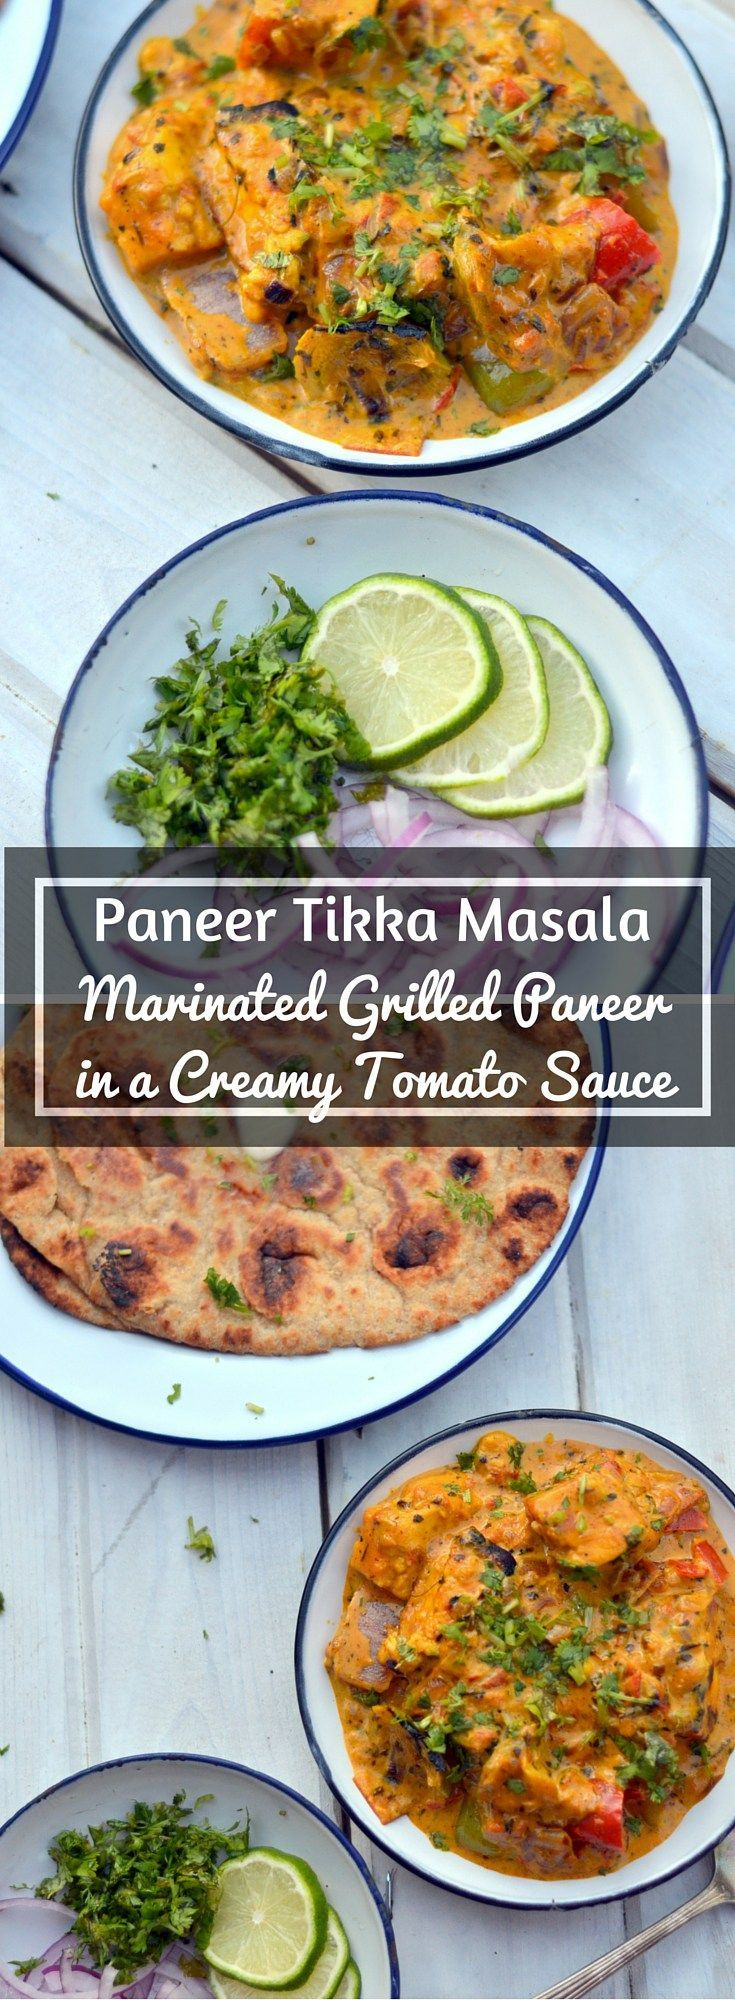 Paneer Tikka Masala - Grilled Marinated Paneer in a Creamy Tomato Sauce - Gluten Free Vegetarian - http://www.cookingcurries.com